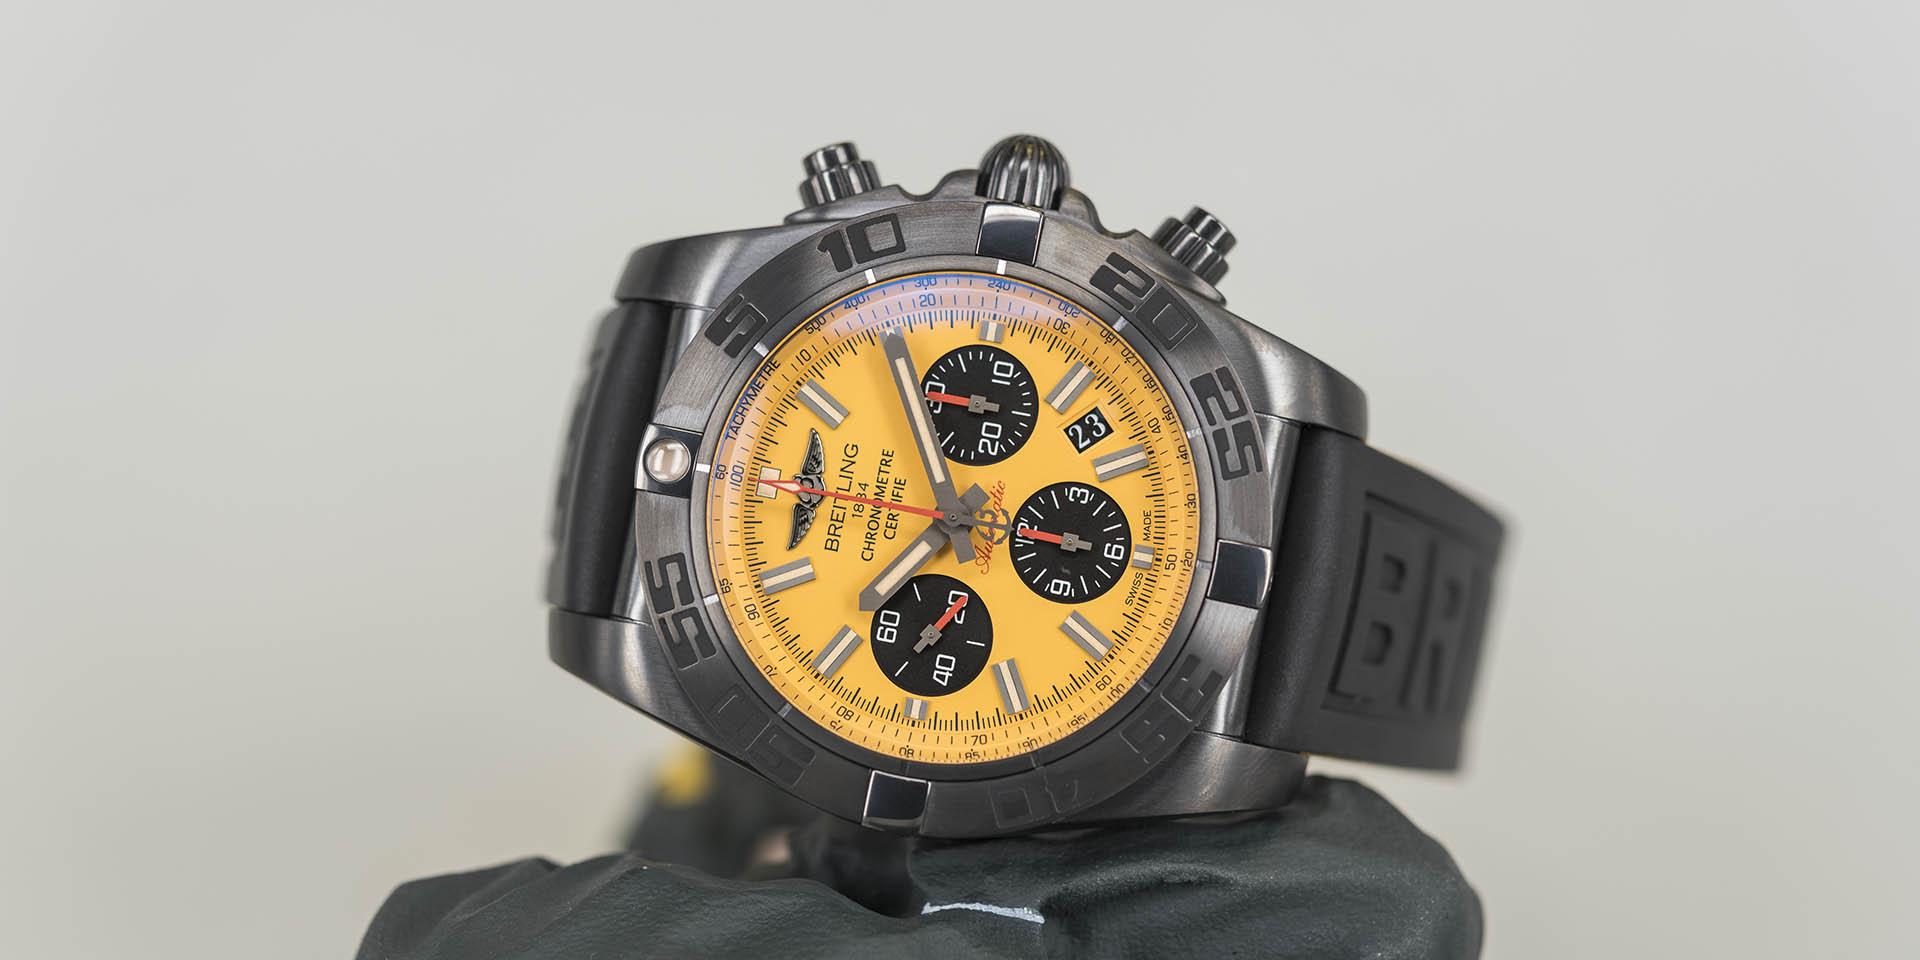 Breitling-Chronomat-44-Blacksteel-Special-Edition-5.jpg